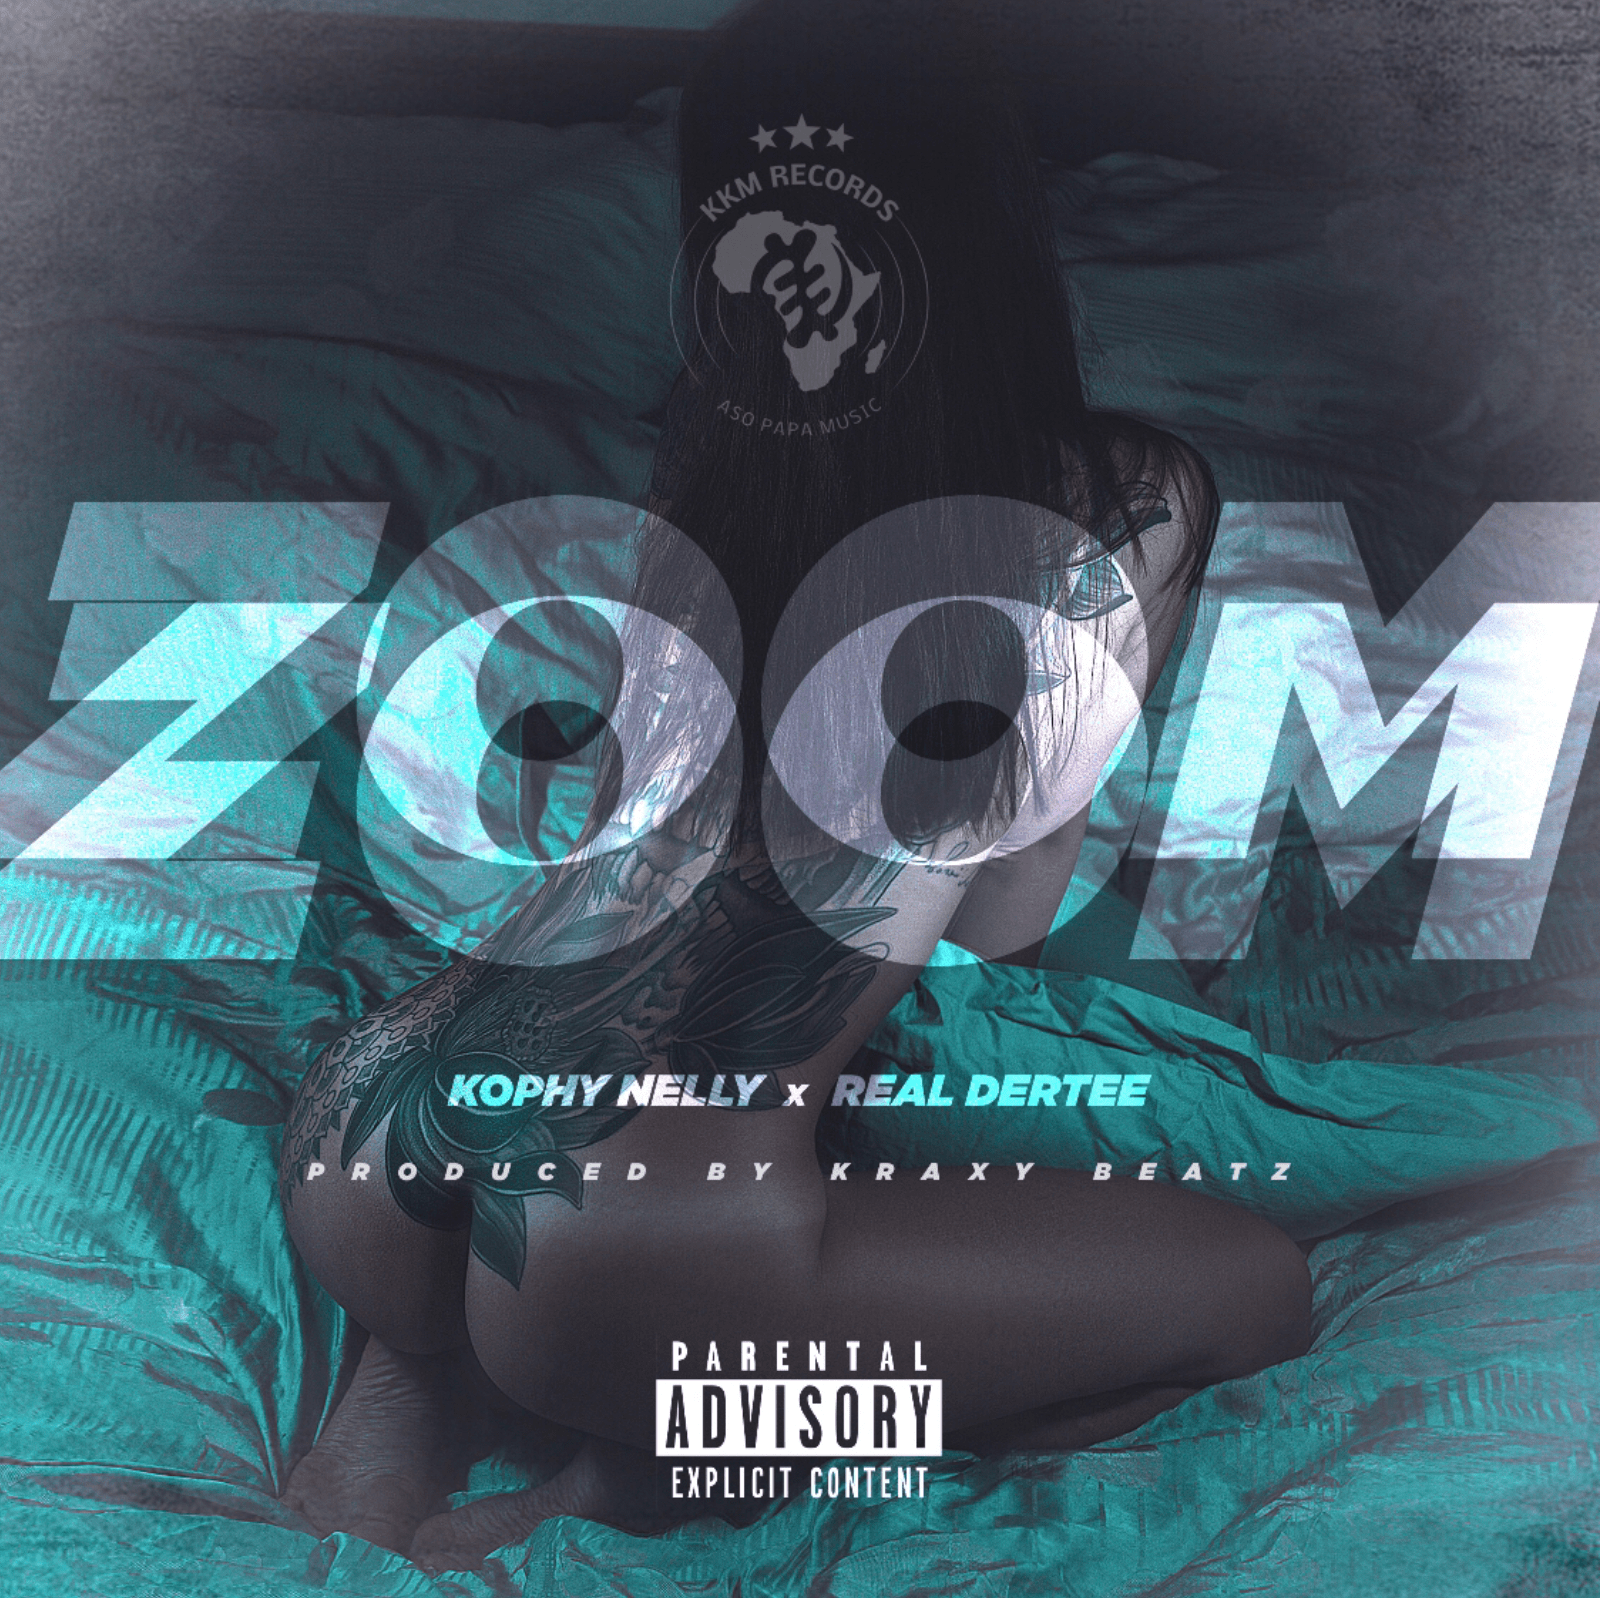 Kophy Nelly - Zoom Zoom + Realdertee - Prod by Kraxy Beatz